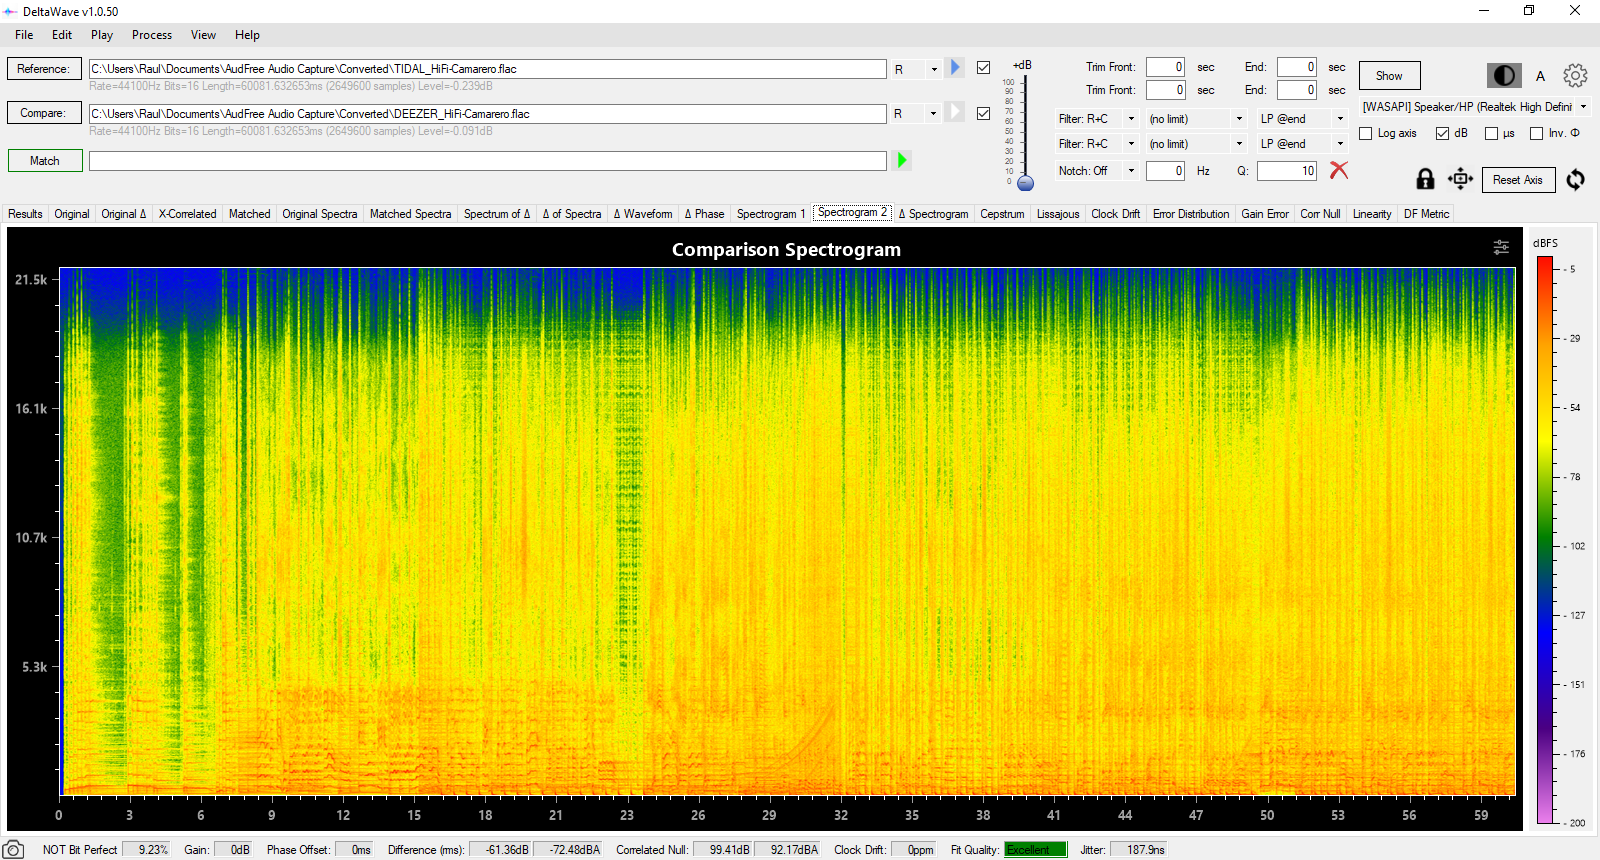 DEEZER_HiFi-Camarero_Spectrogram.png